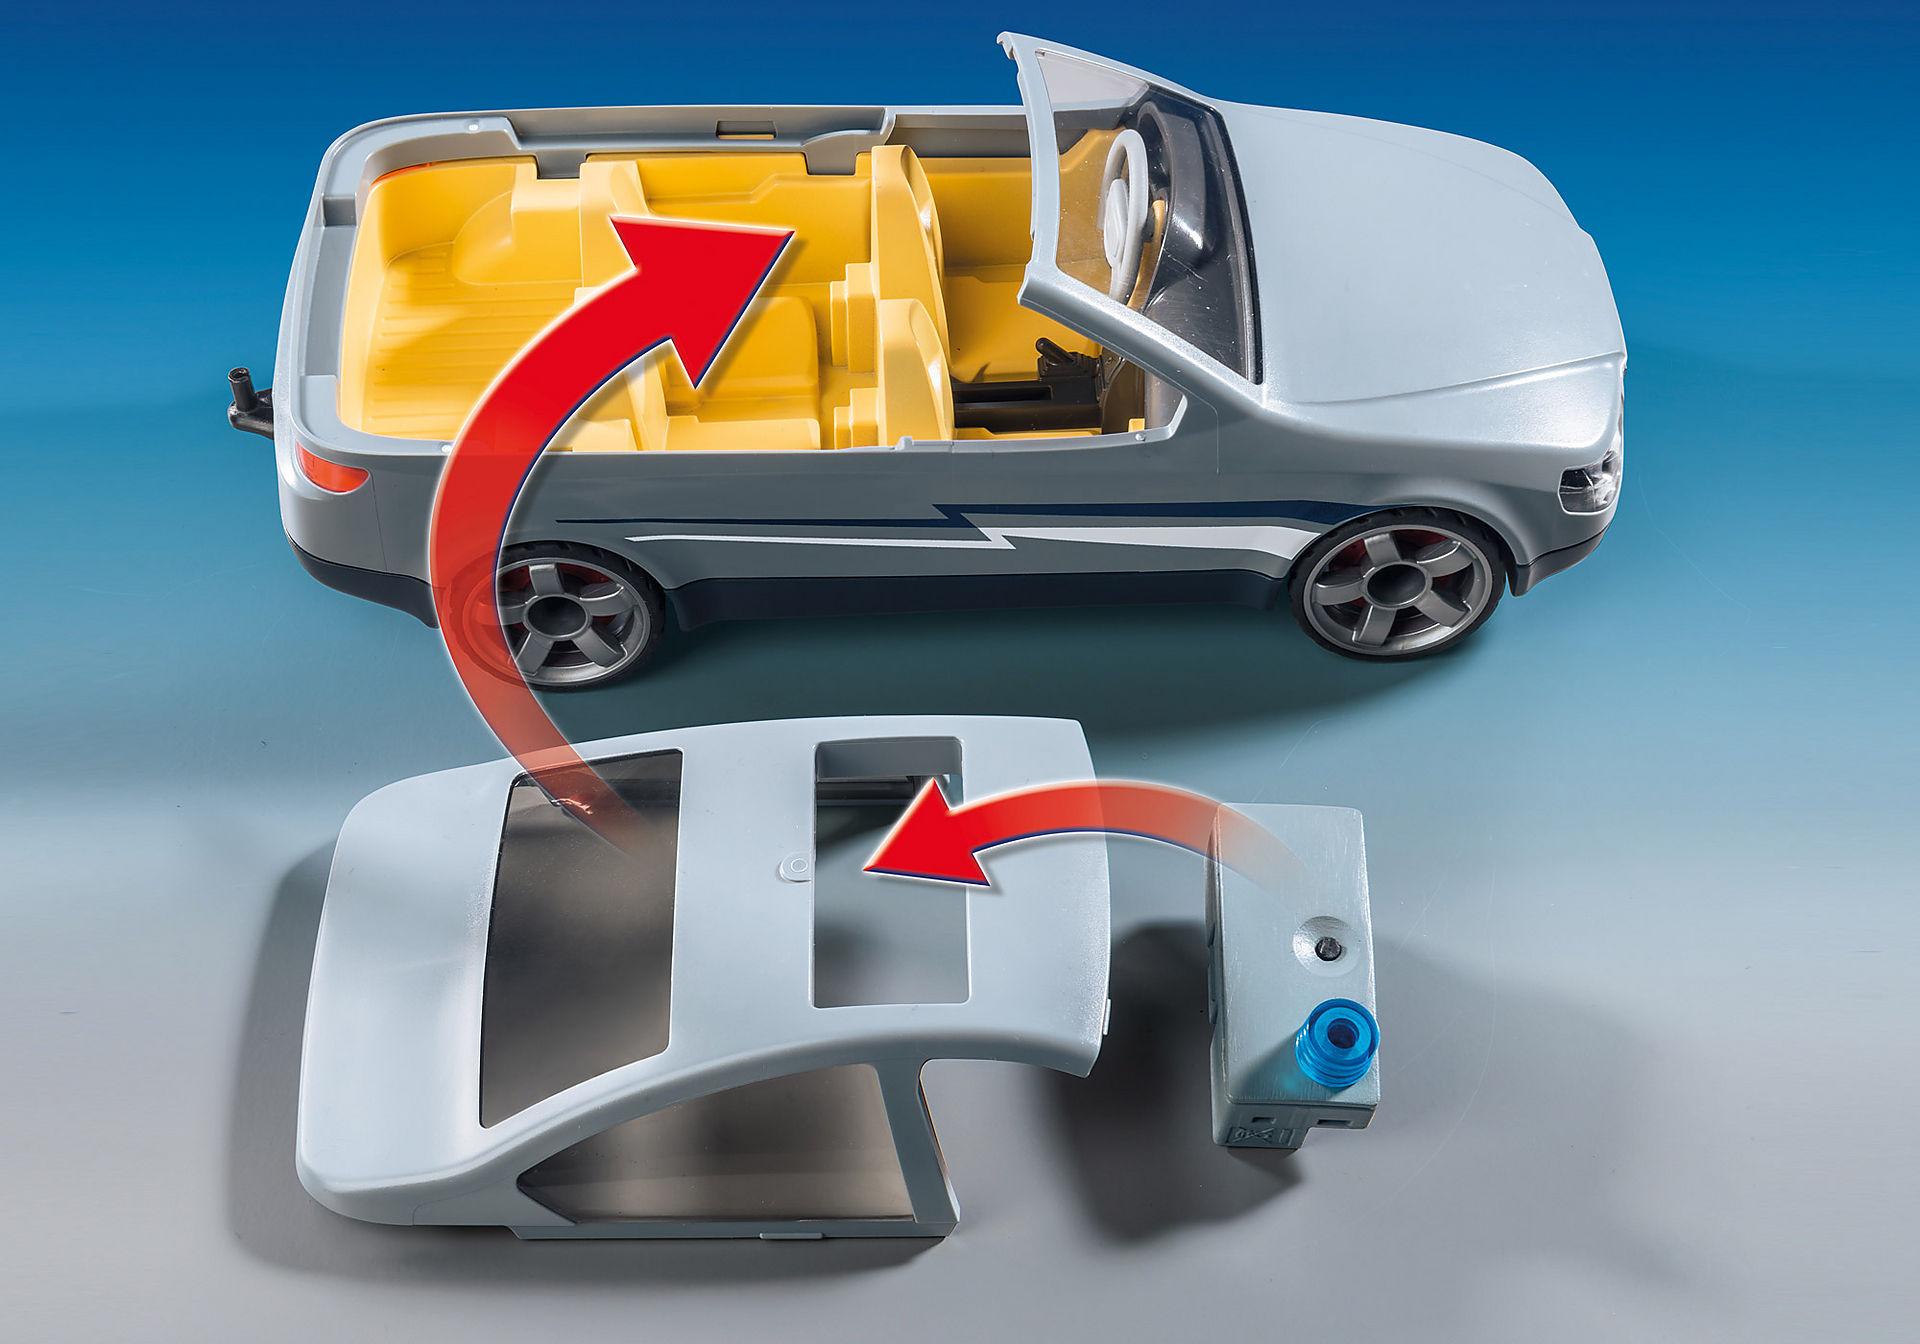 http://media.playmobil.com/i/playmobil/9361_product_extra1/SWAT Undercover Car